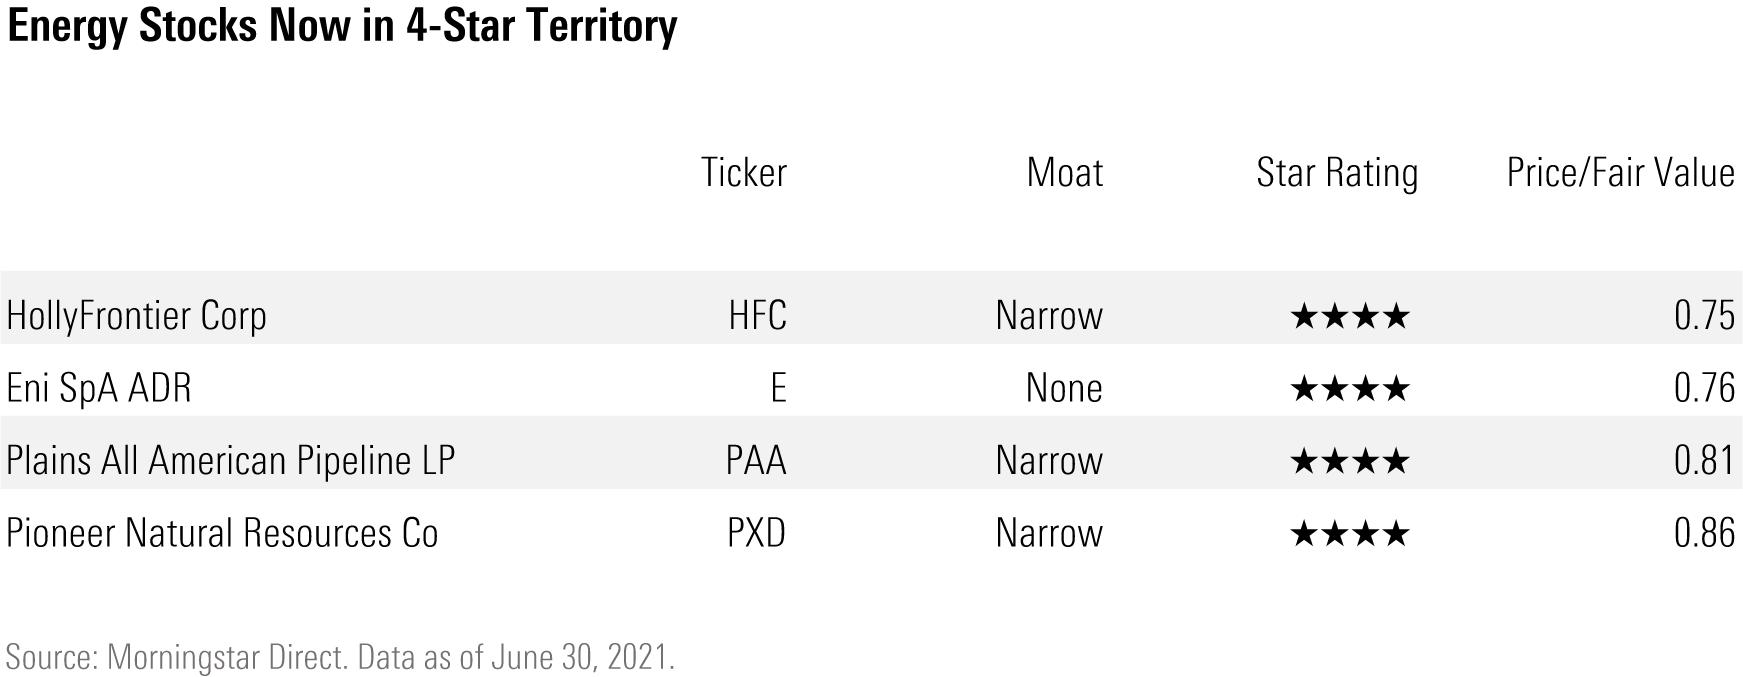 Energy stocks now in 4-star territory